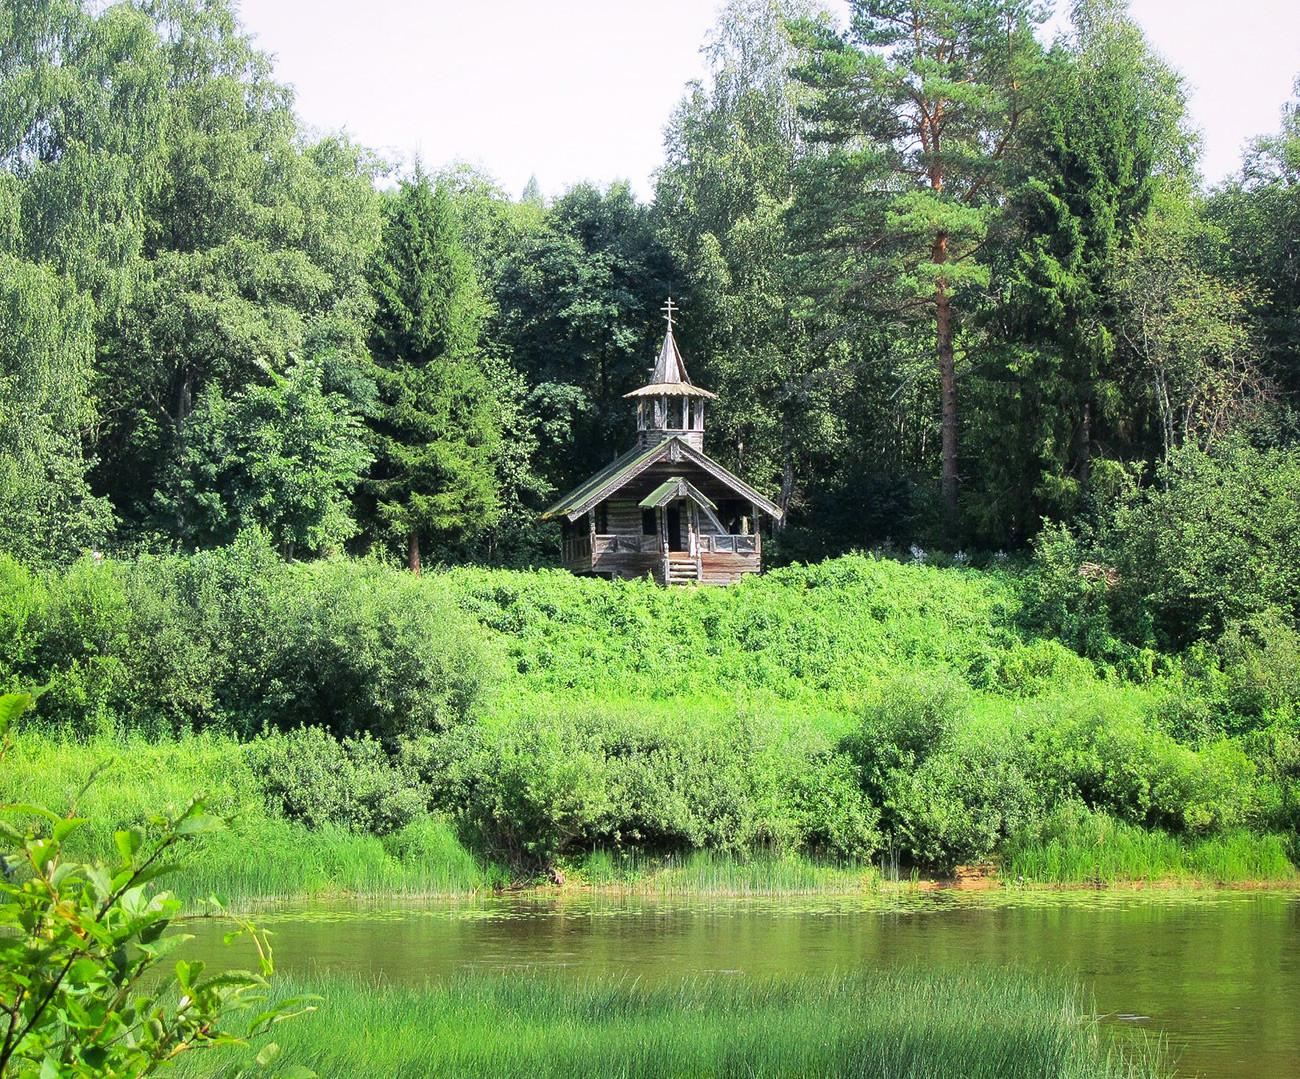 Capilla de Tijvin, pueblo de Bolshóye Péjovo (río Mstá), región de Nóvgorod, siglo XVII